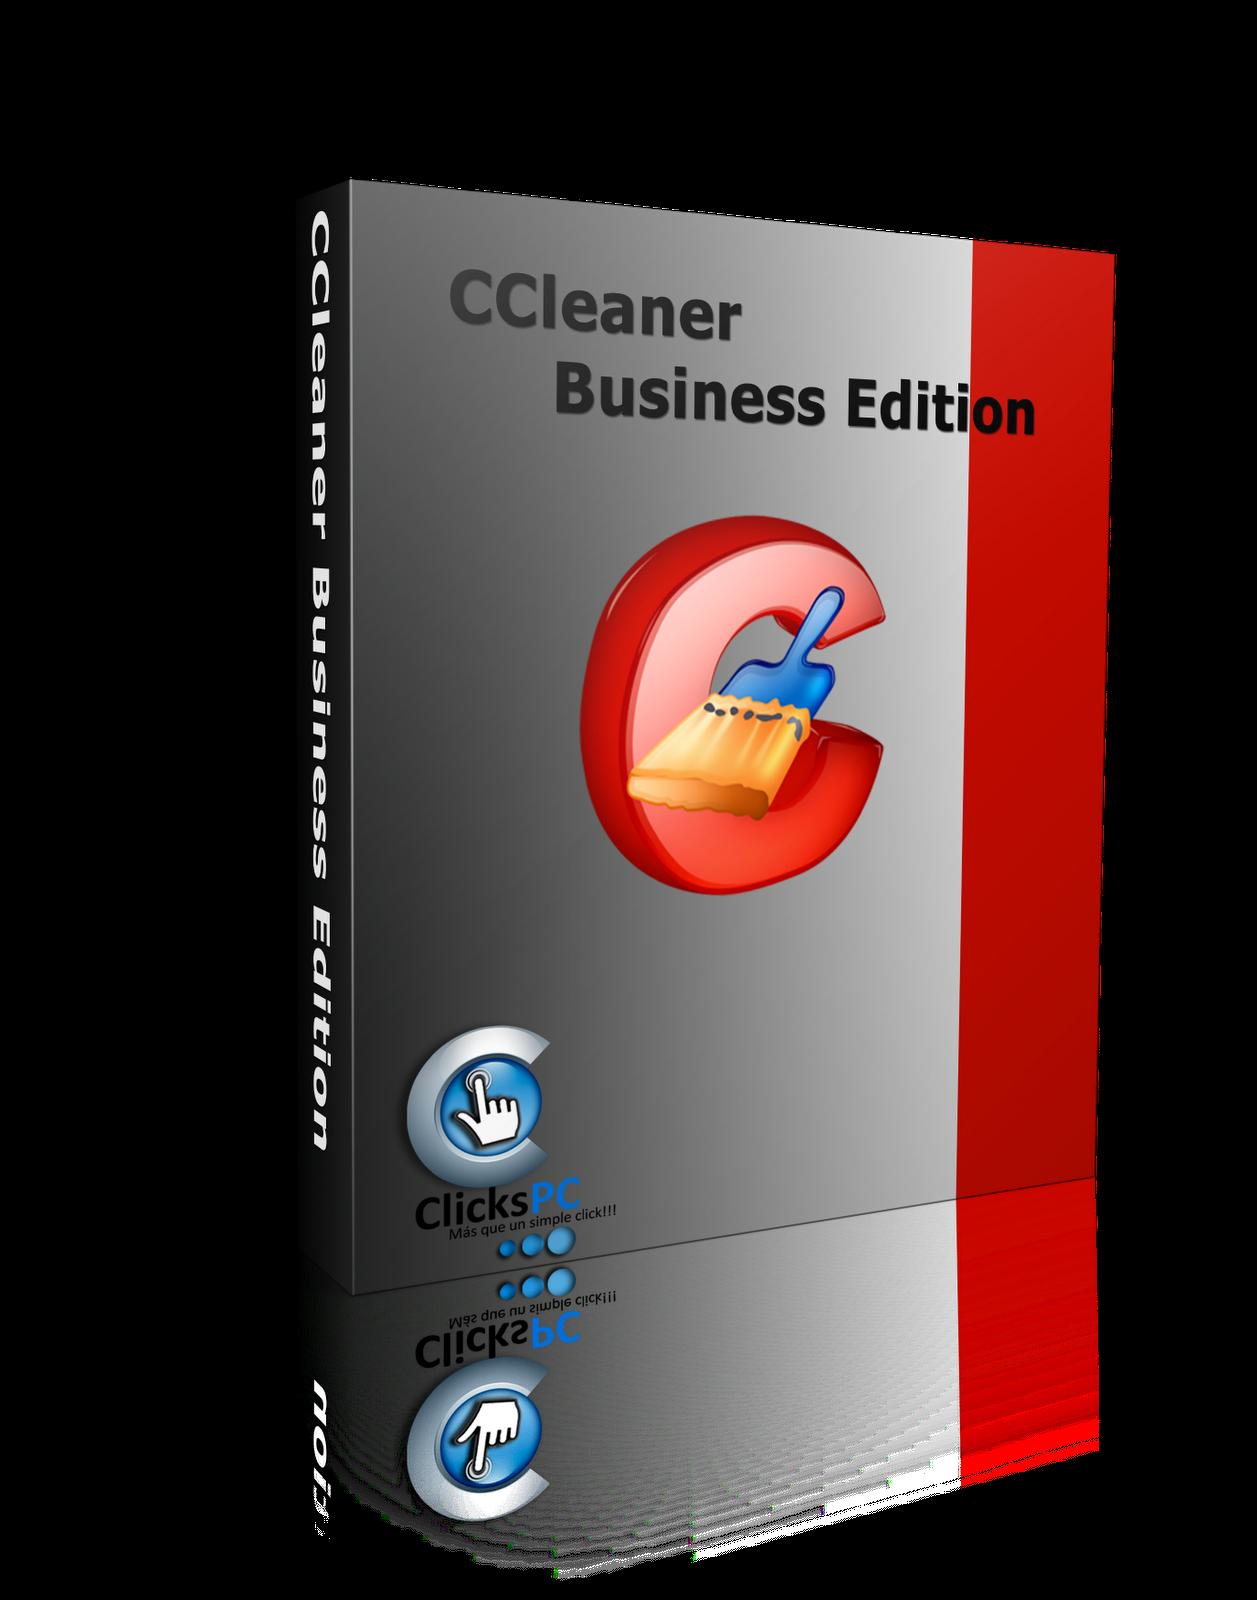 ccleaner full version Archives